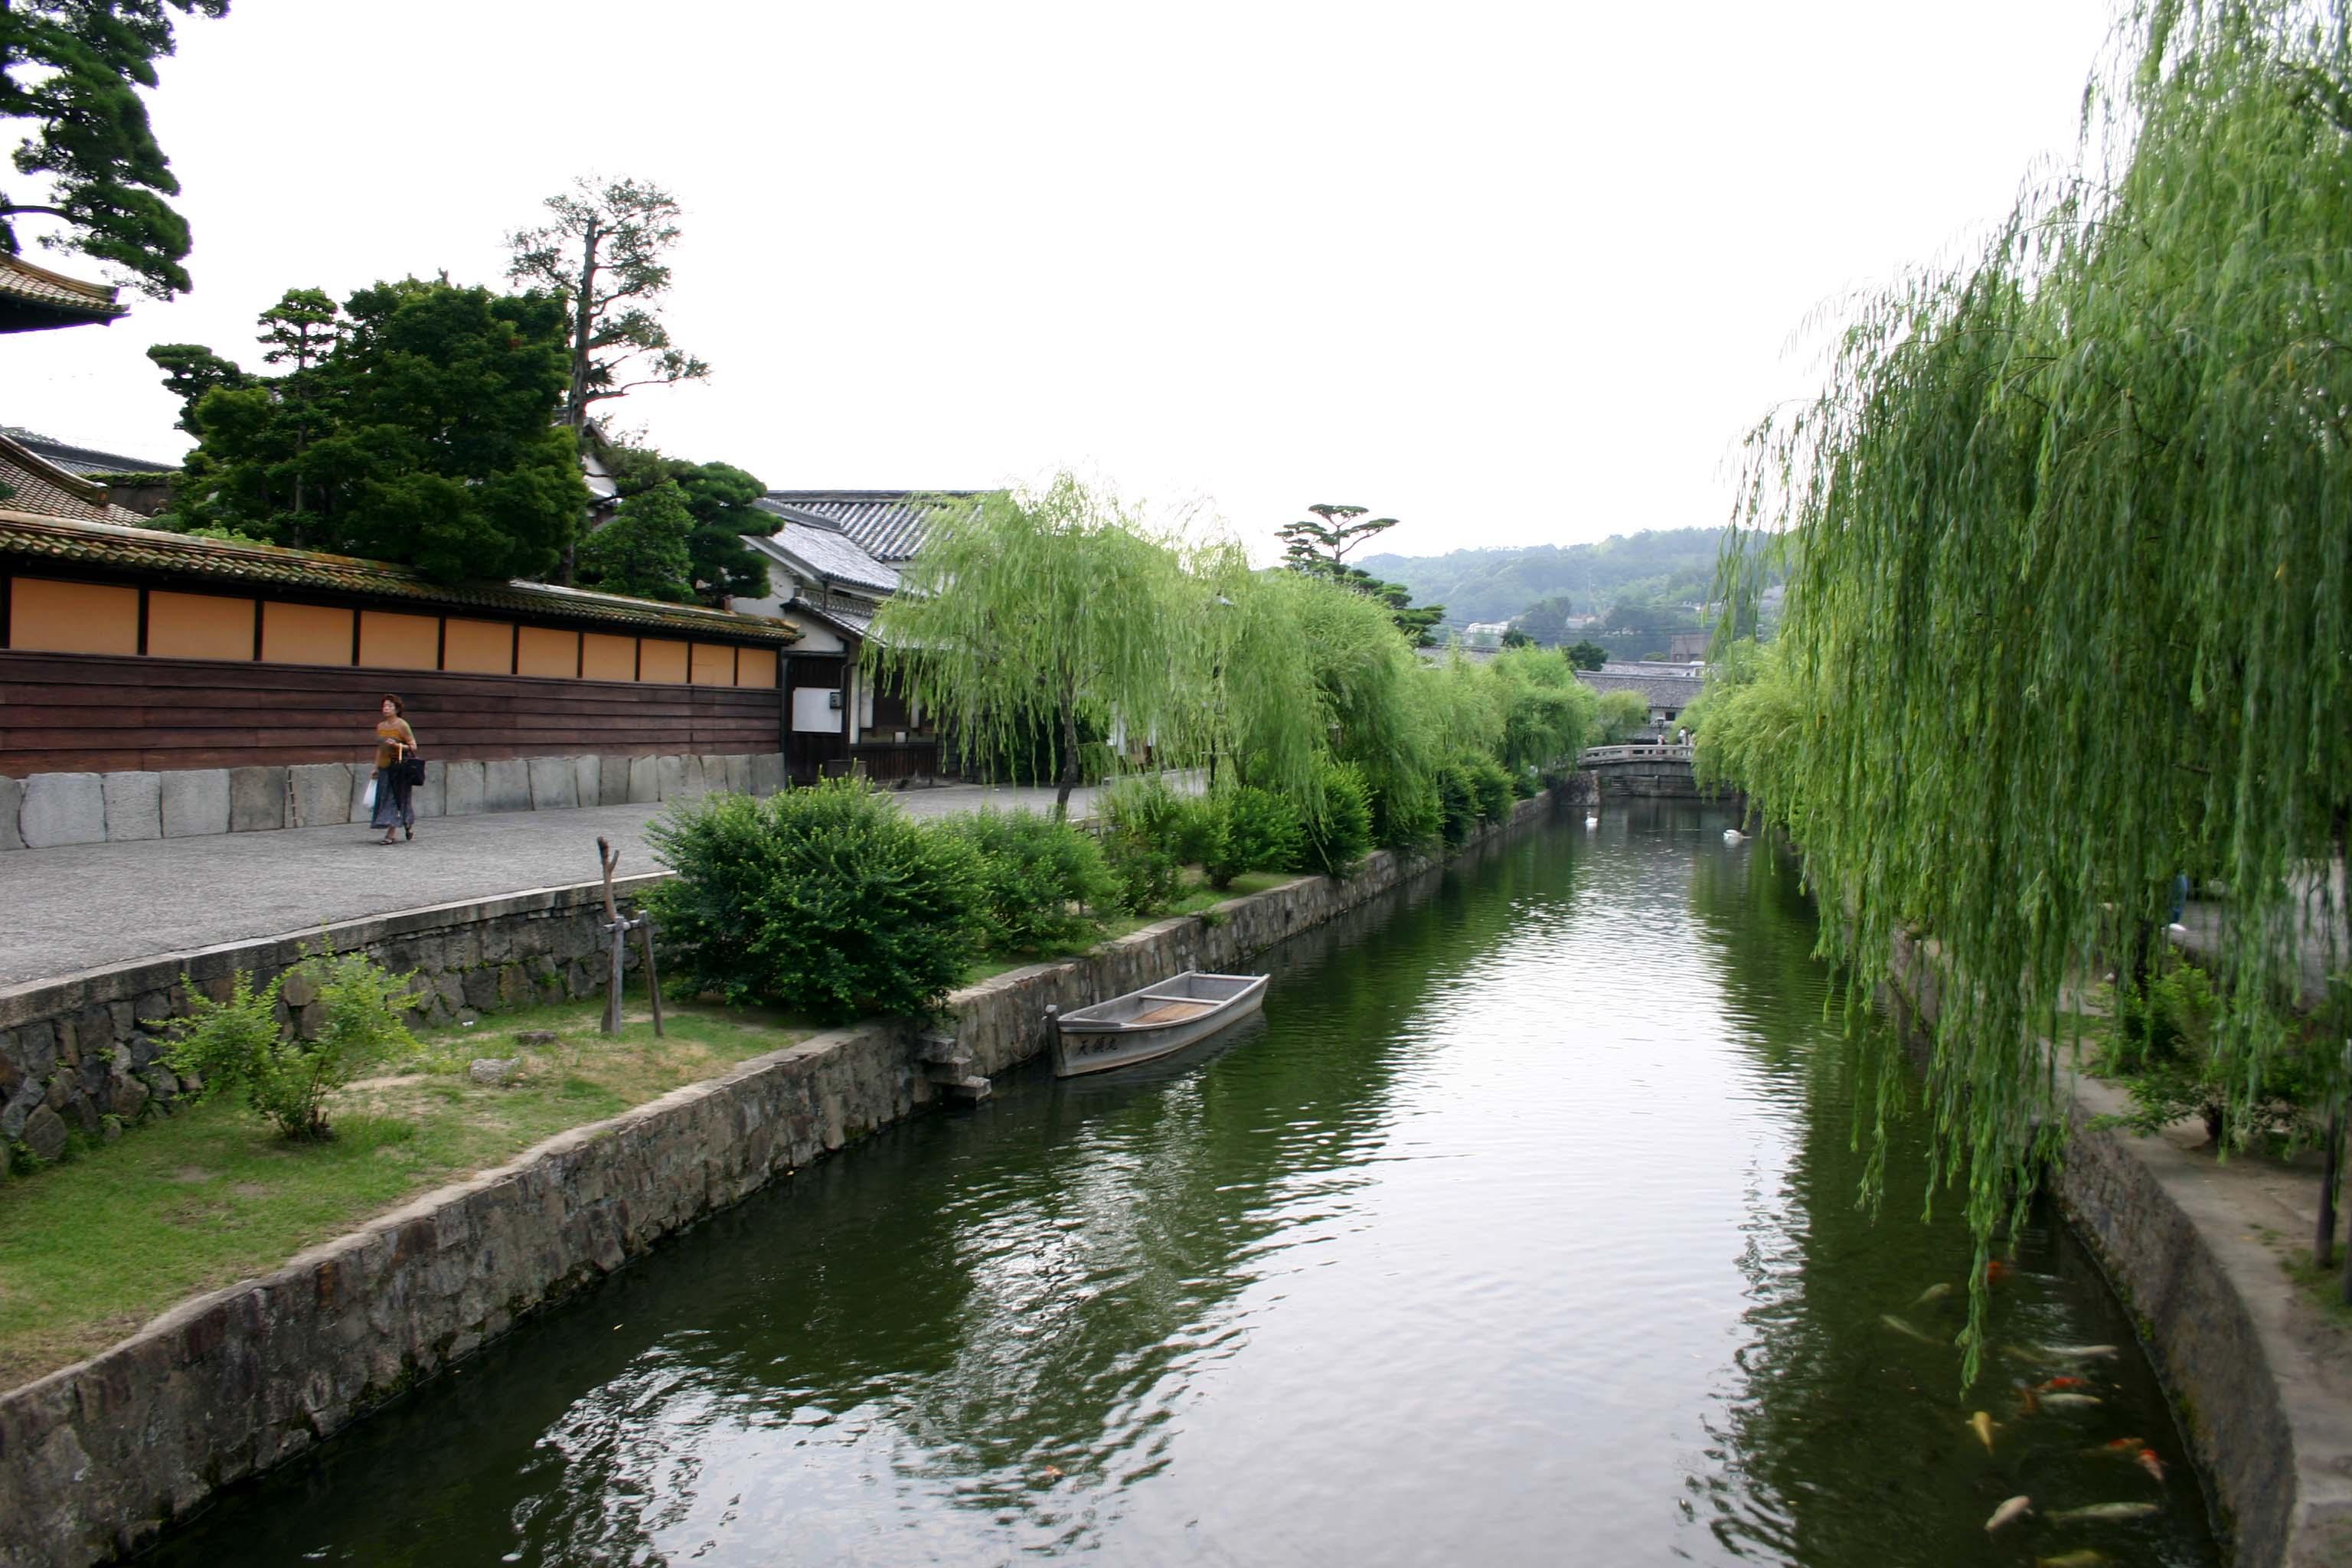 09倉敷の屋敷町